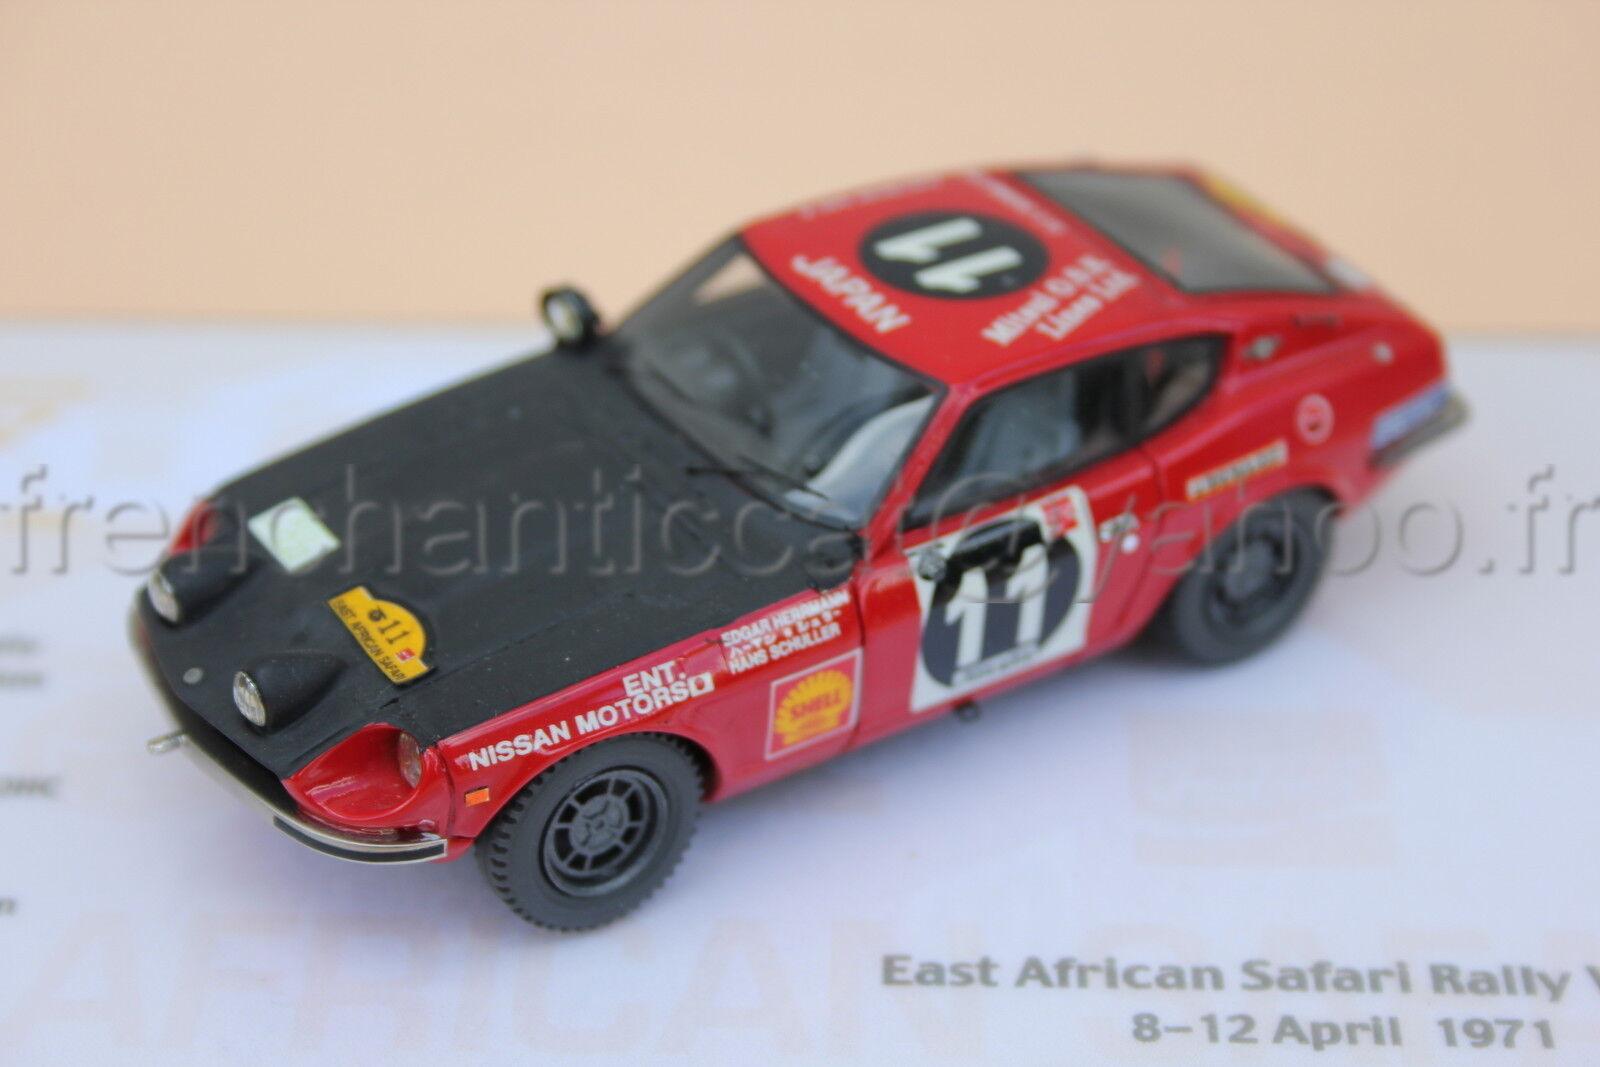 C067 Car Datsun 240 Z Safari 1971 1 43 Heco Miniaturen Provence Moulage